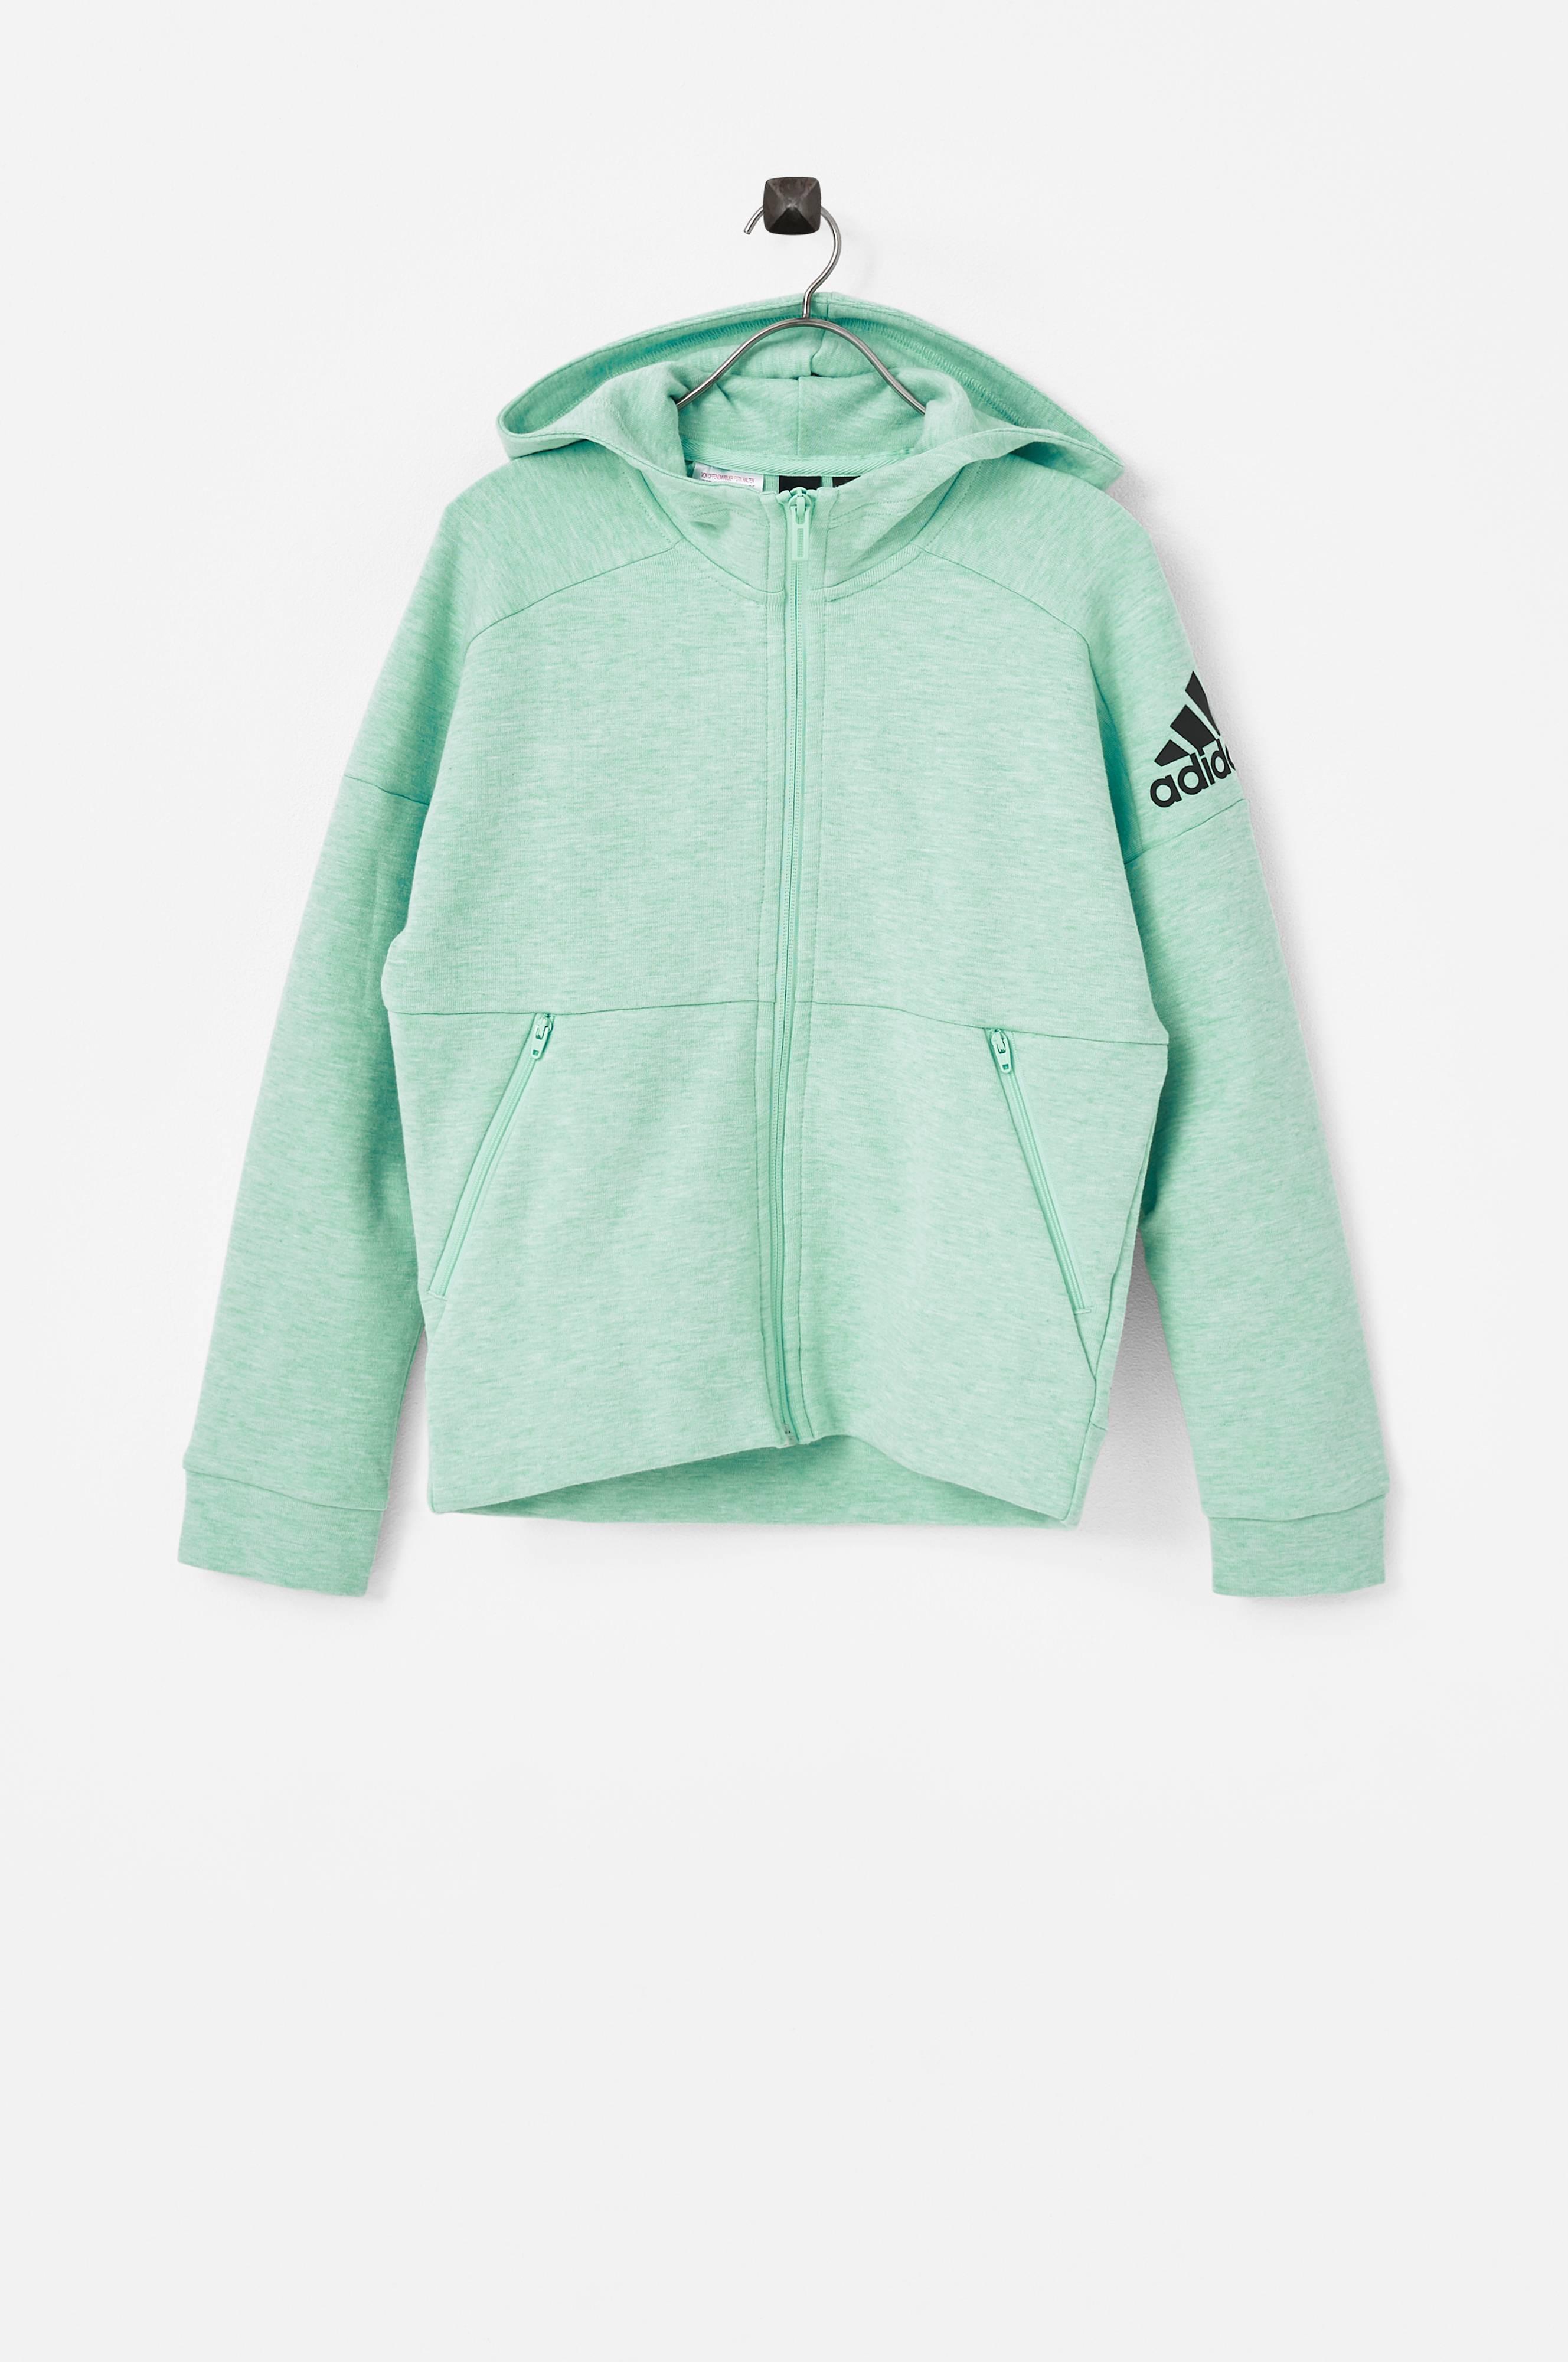 Adidas mint green track jacket